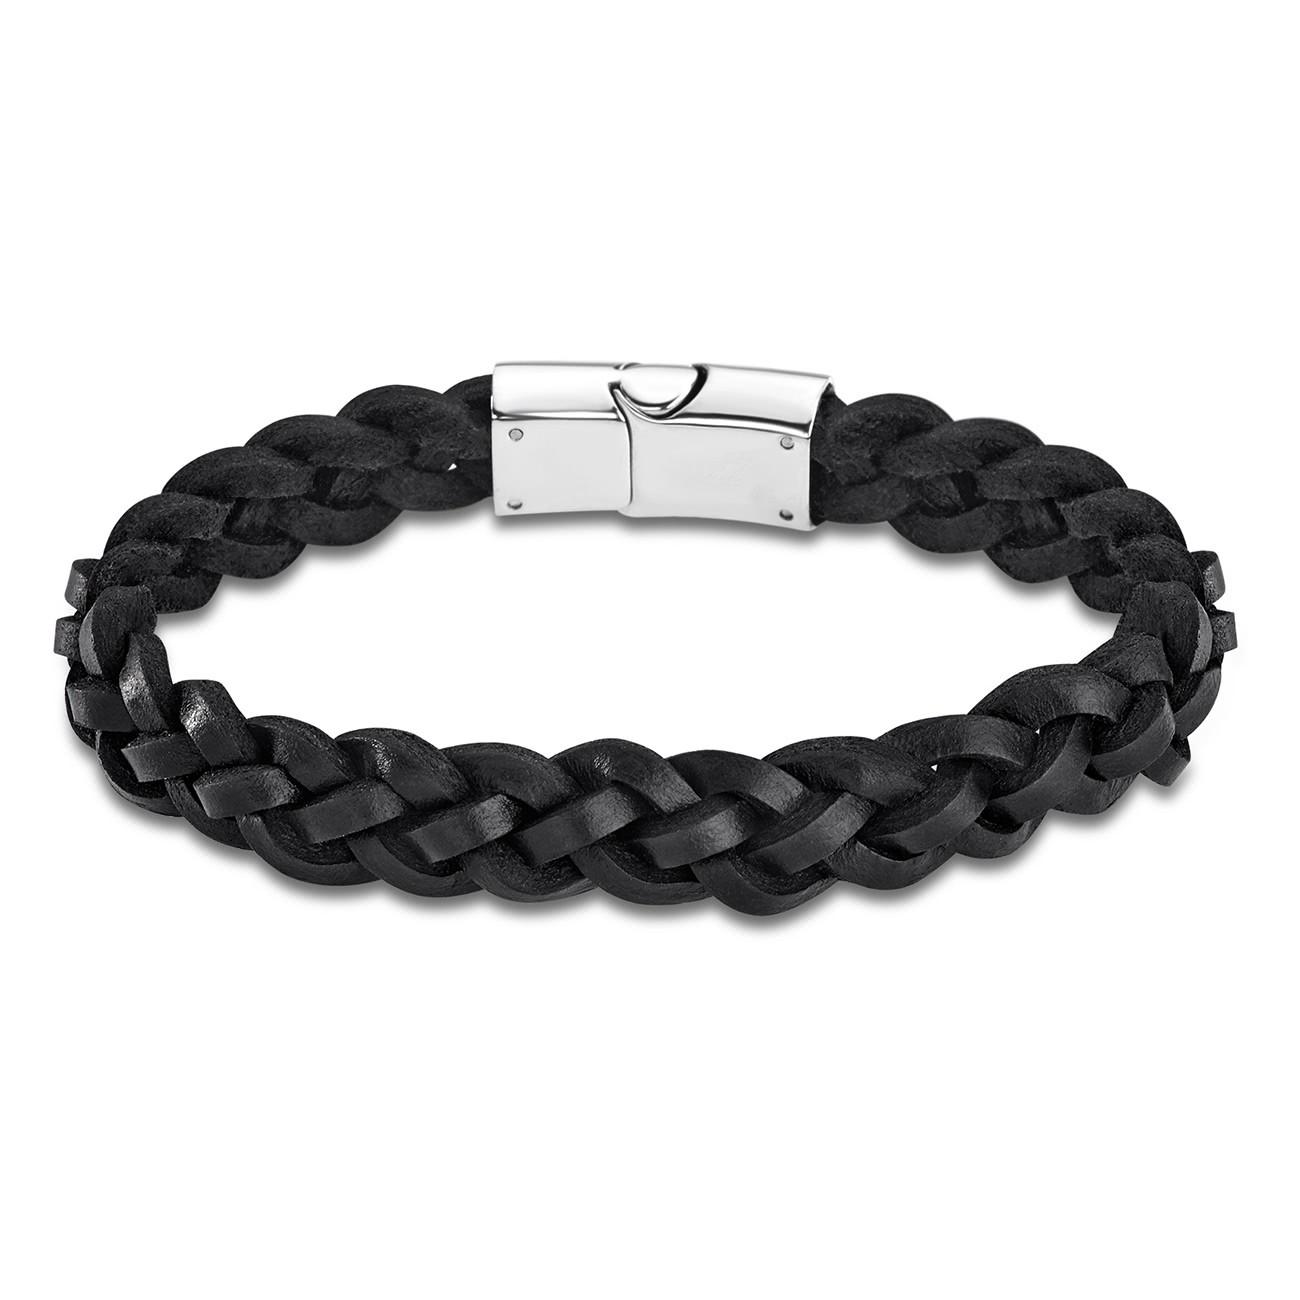 LOTUS Style Armband Herren LS1811-2/2 Leder silber schwarz JLS1811-2-2